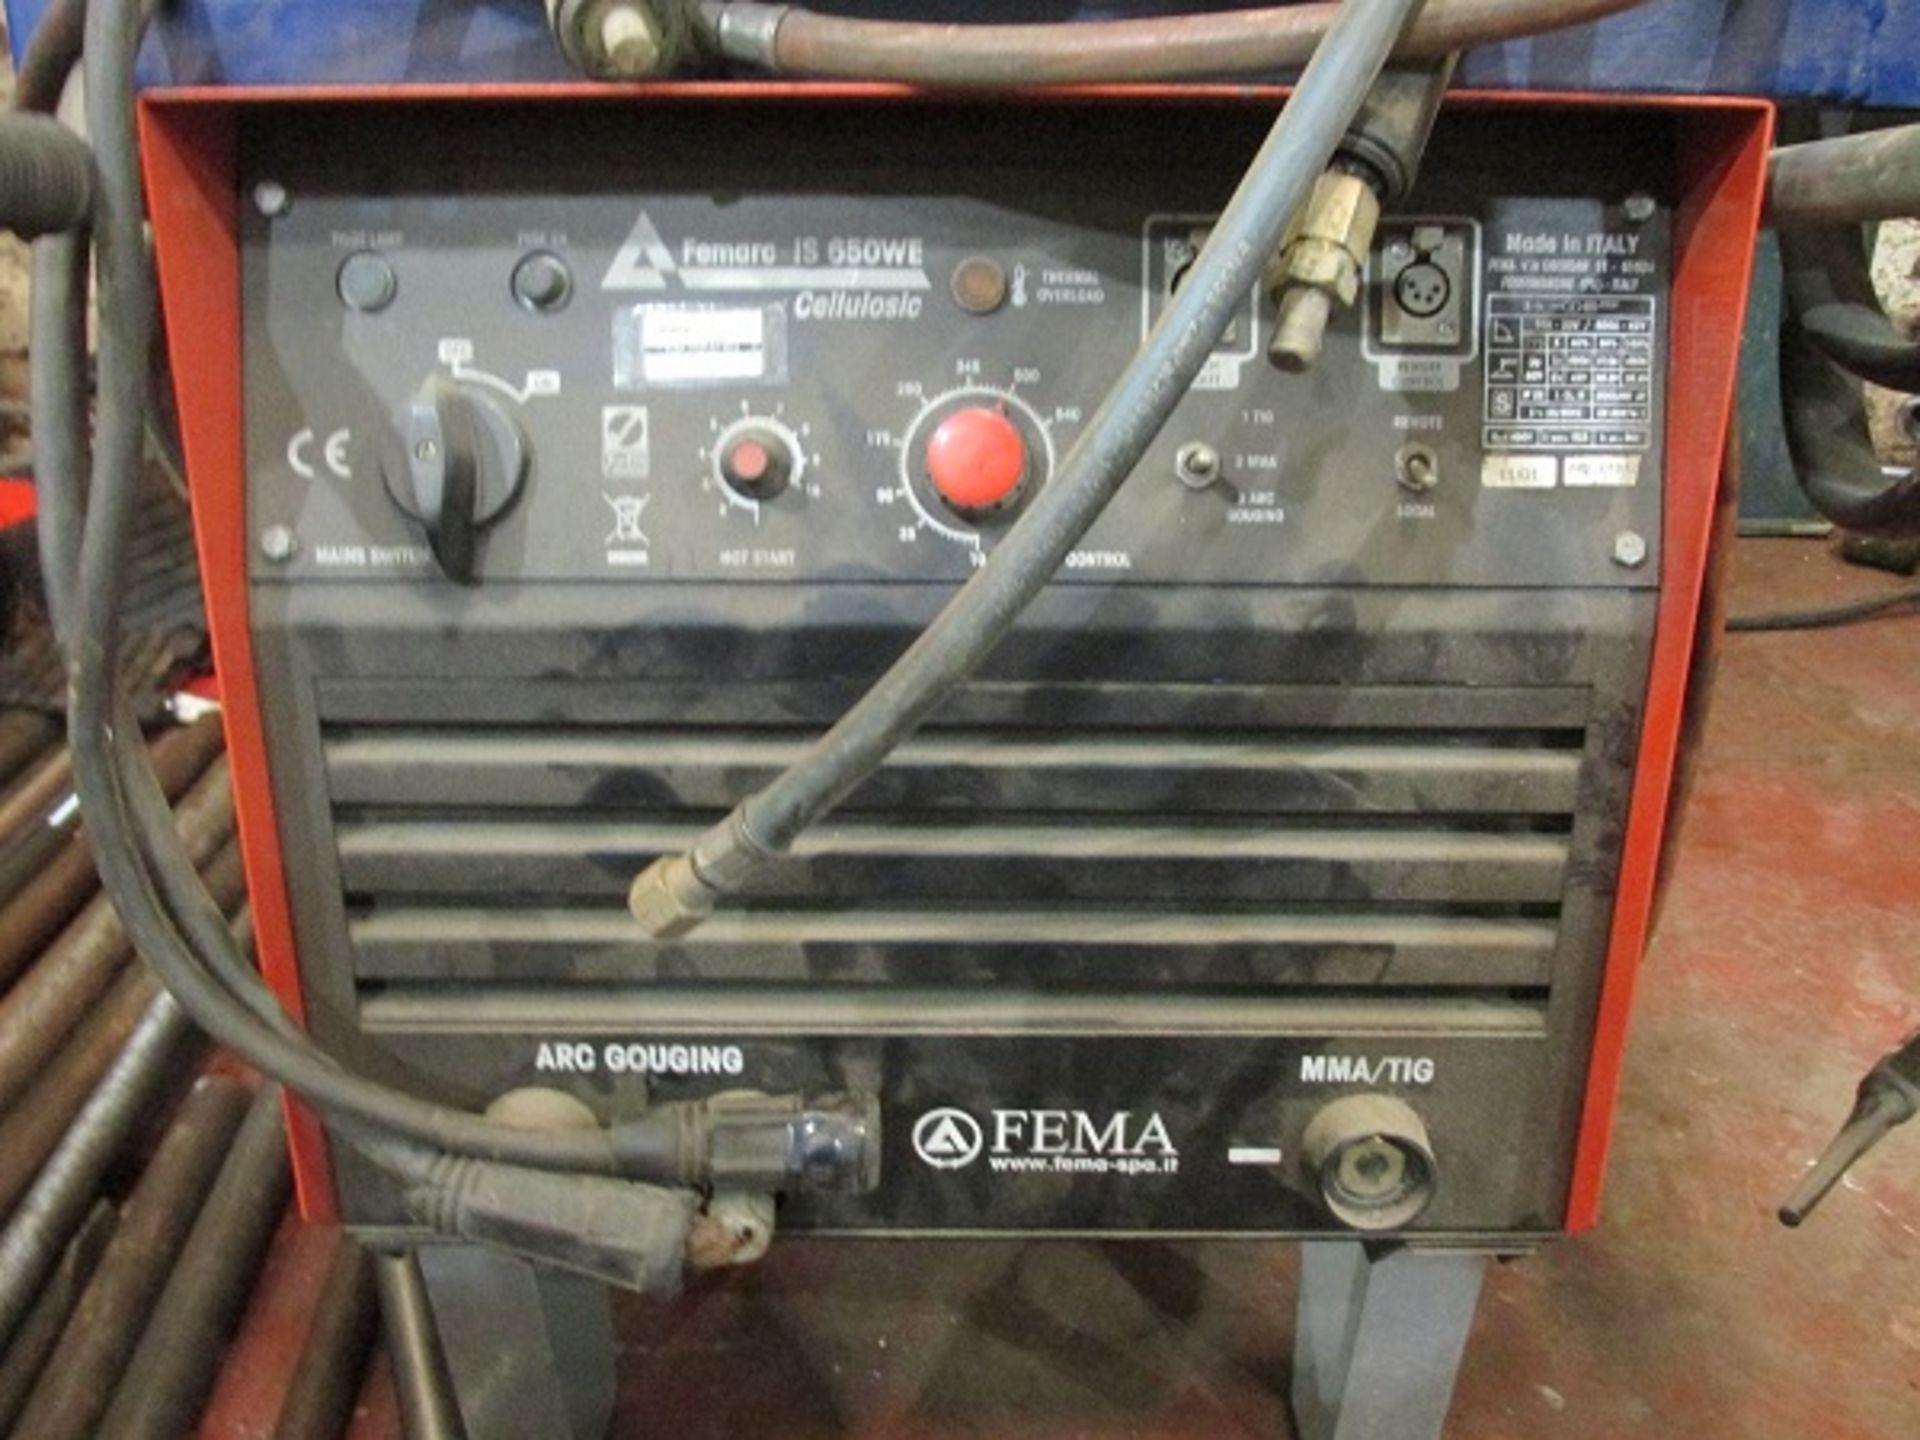 Los 30 - FEMA FERMAC IS 650 WE Cellulosic Welder